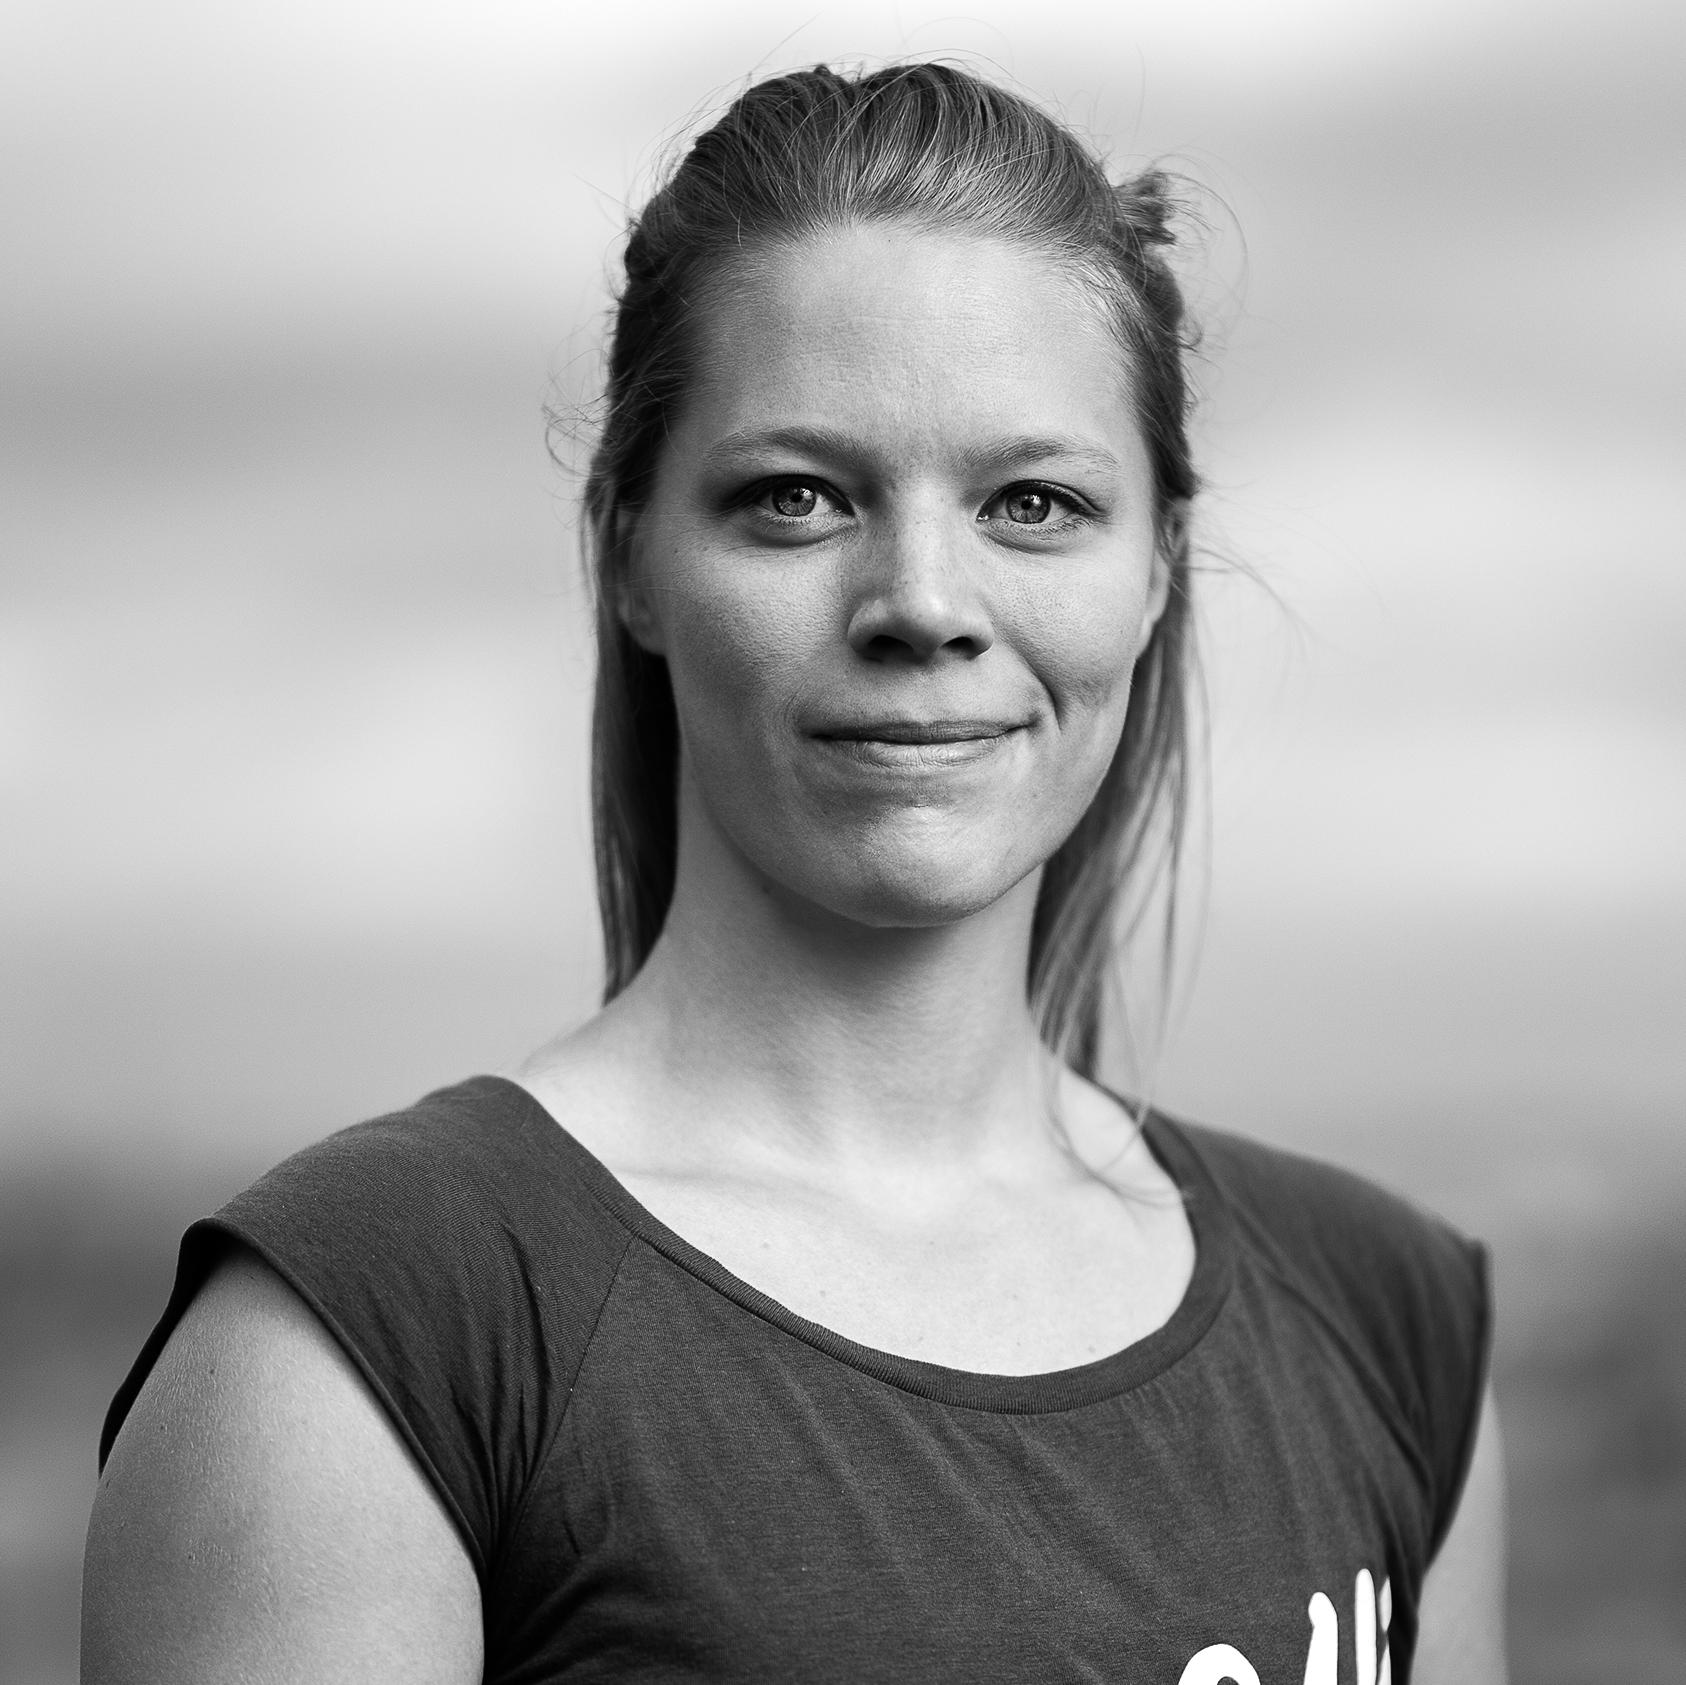 AnnSofie Svensson